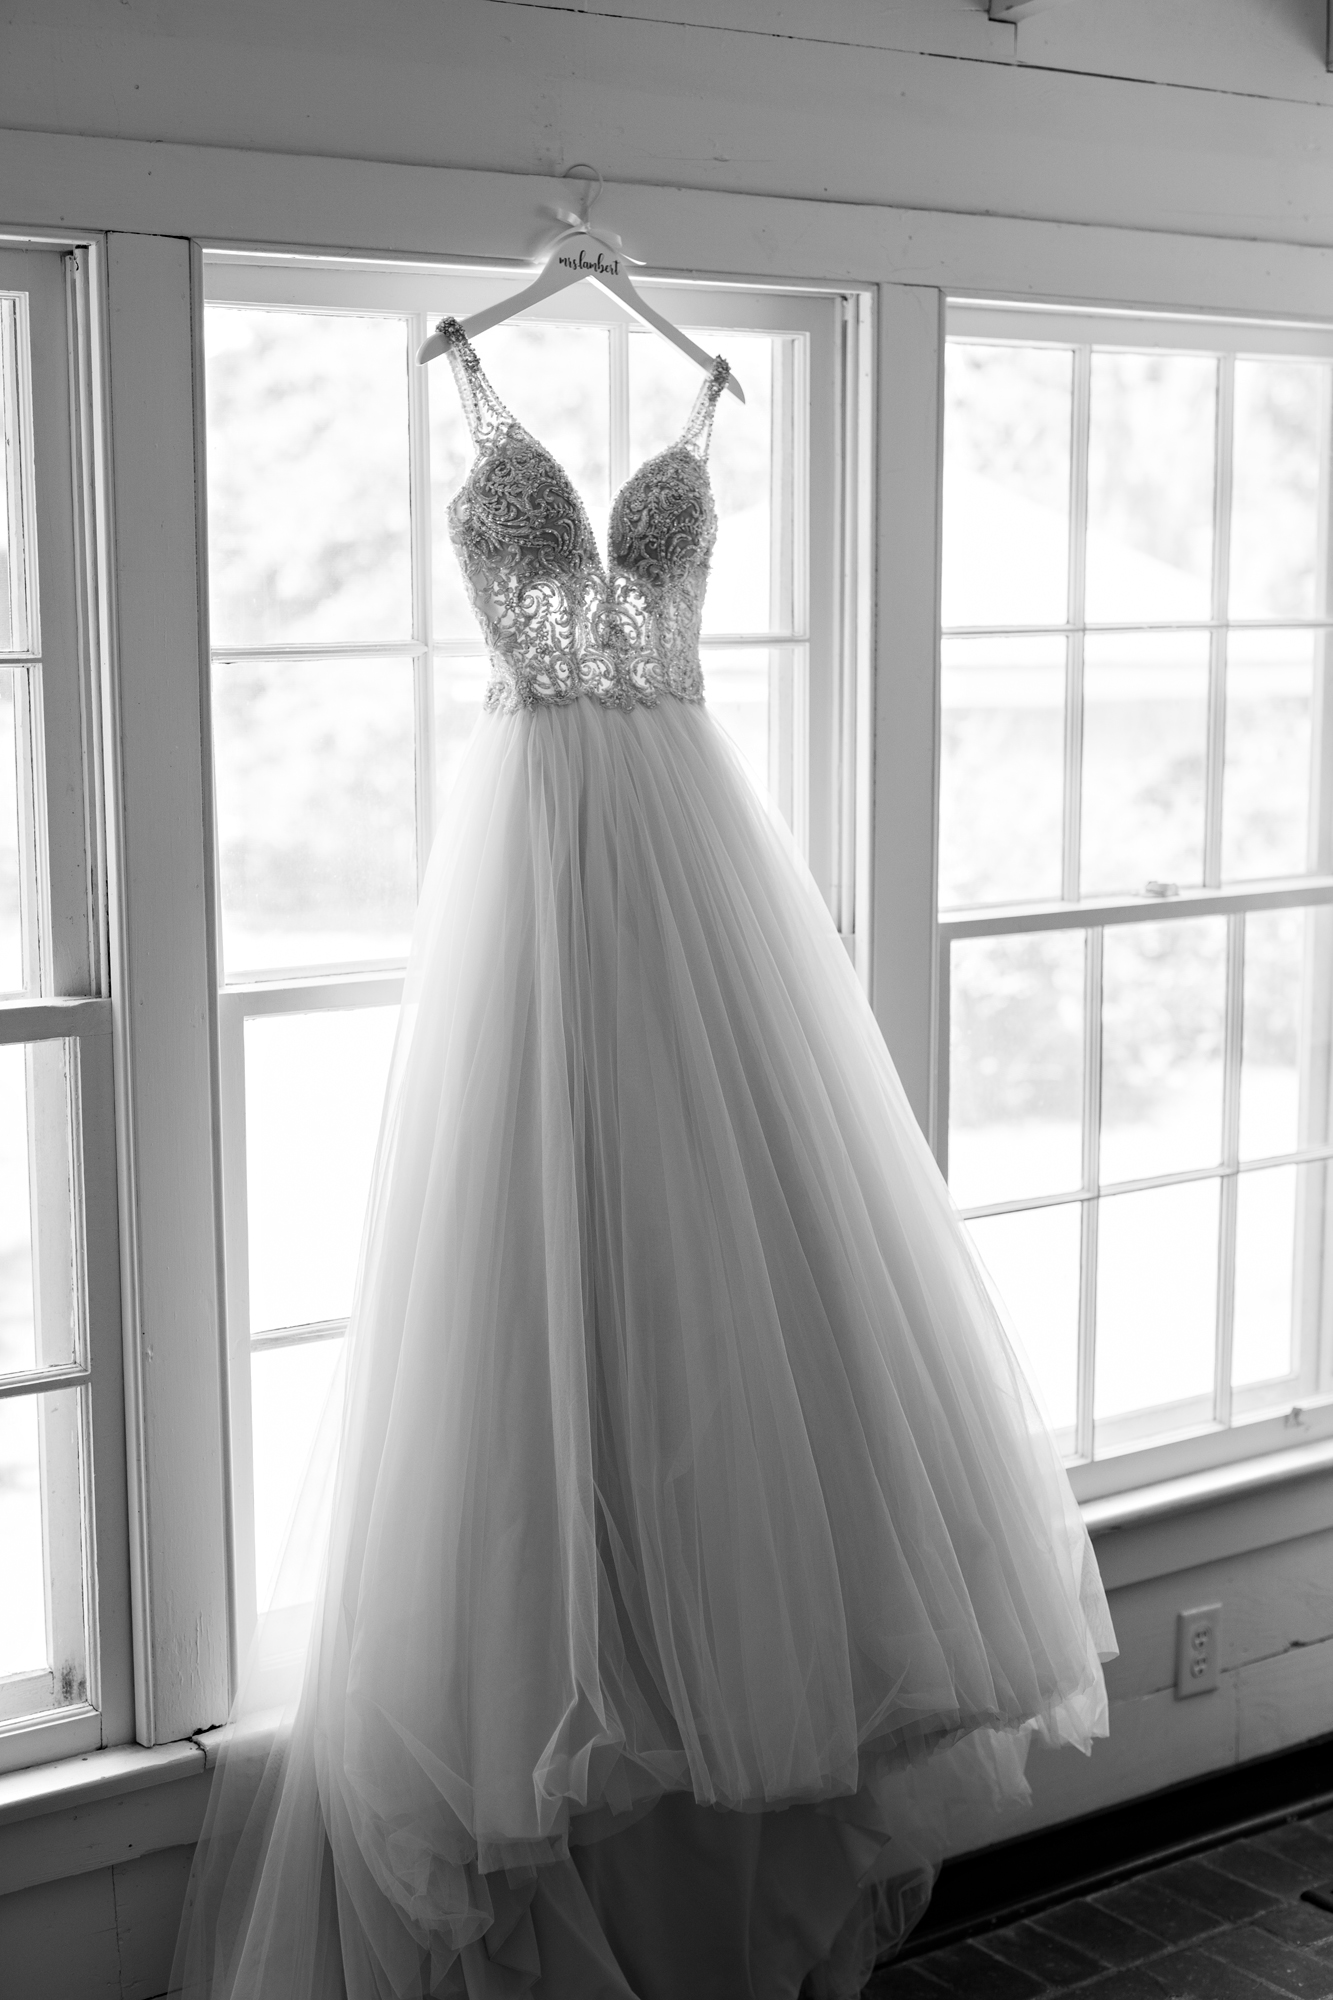 Alabama-Photographers-Nick-Drollette-Wedding-Photography-102.jpg